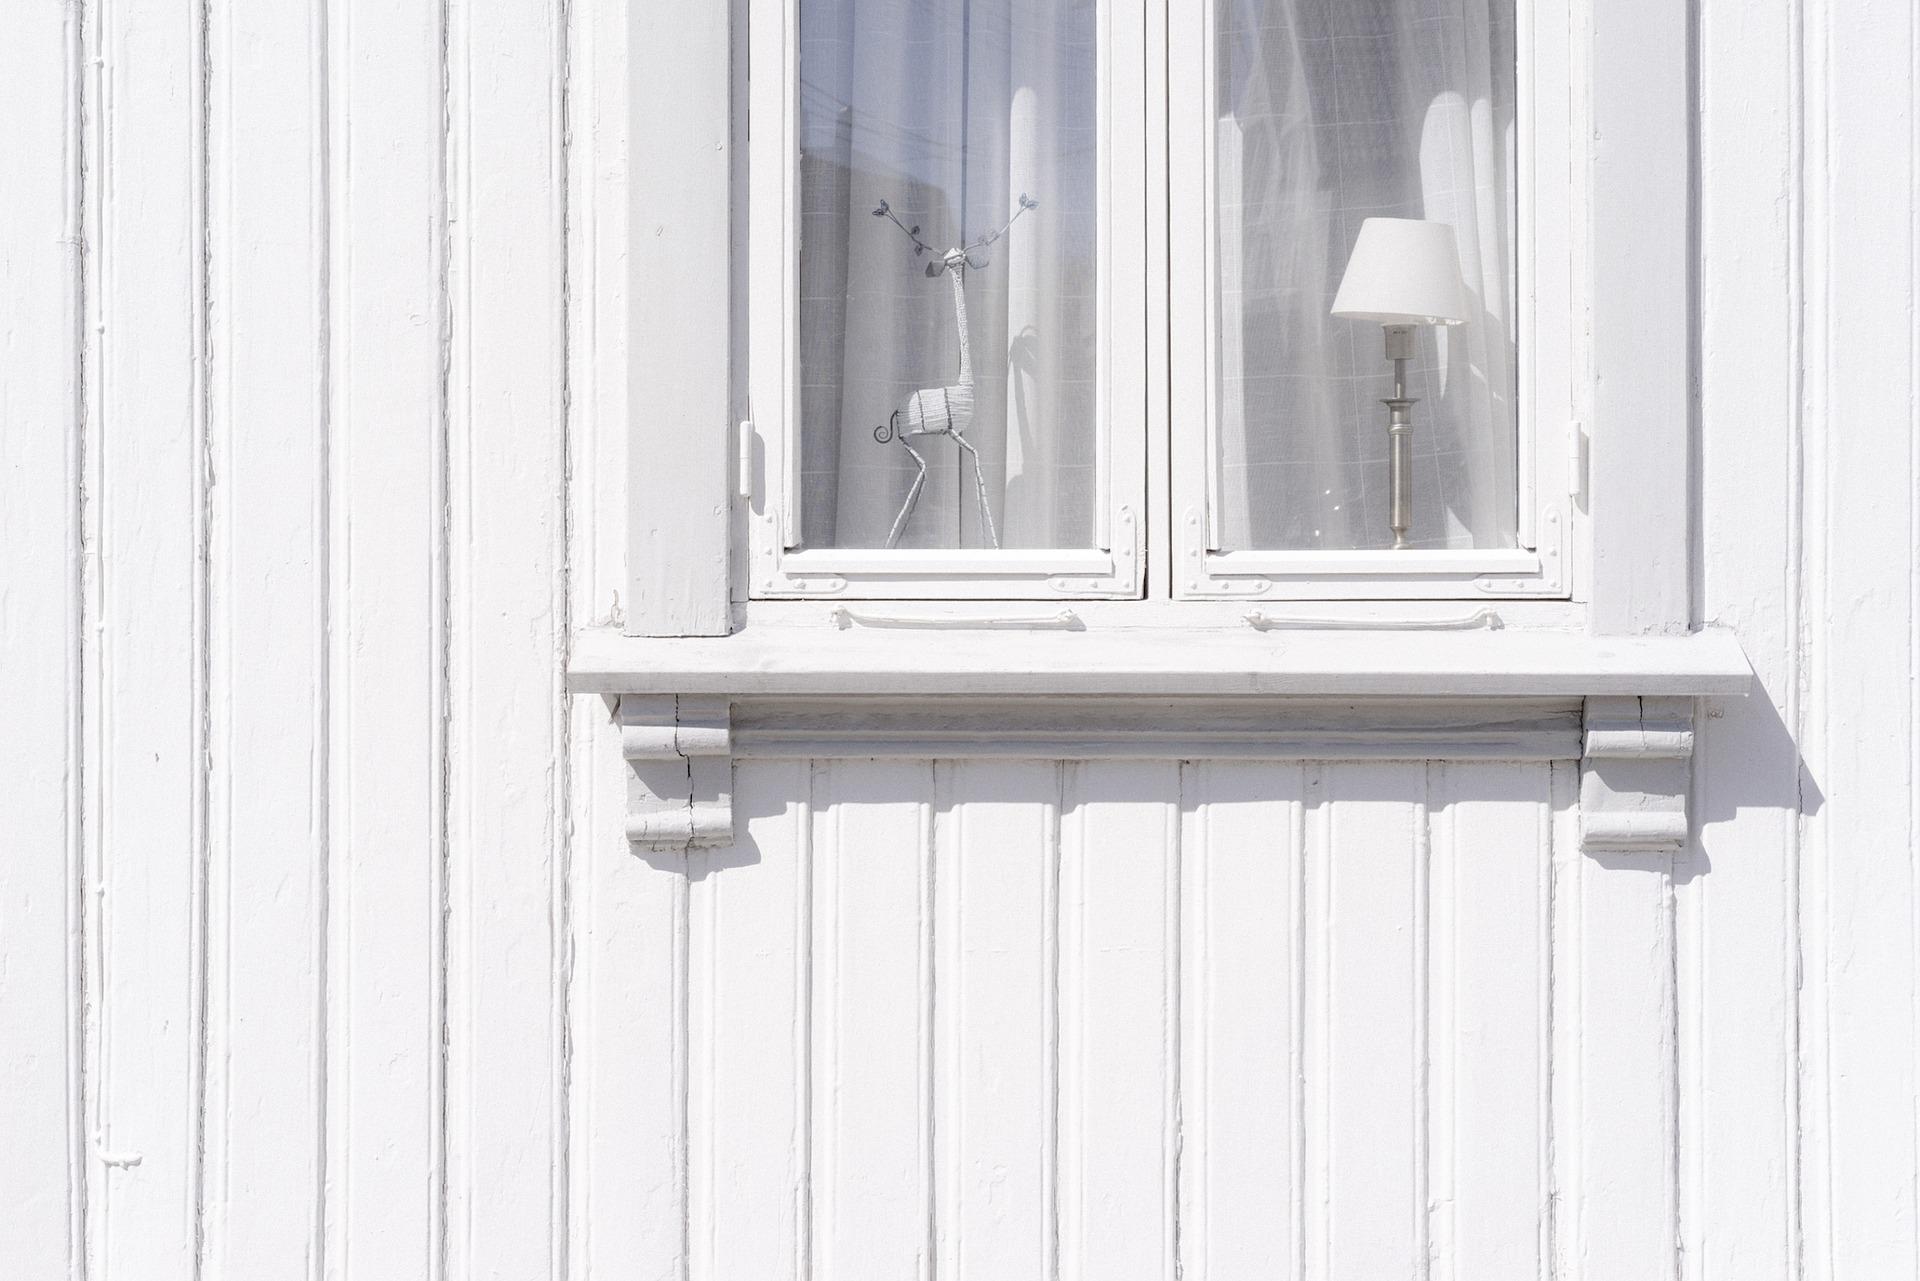 Holzfenster Kosten Holzfenster Preise Holzfenster Holzarten